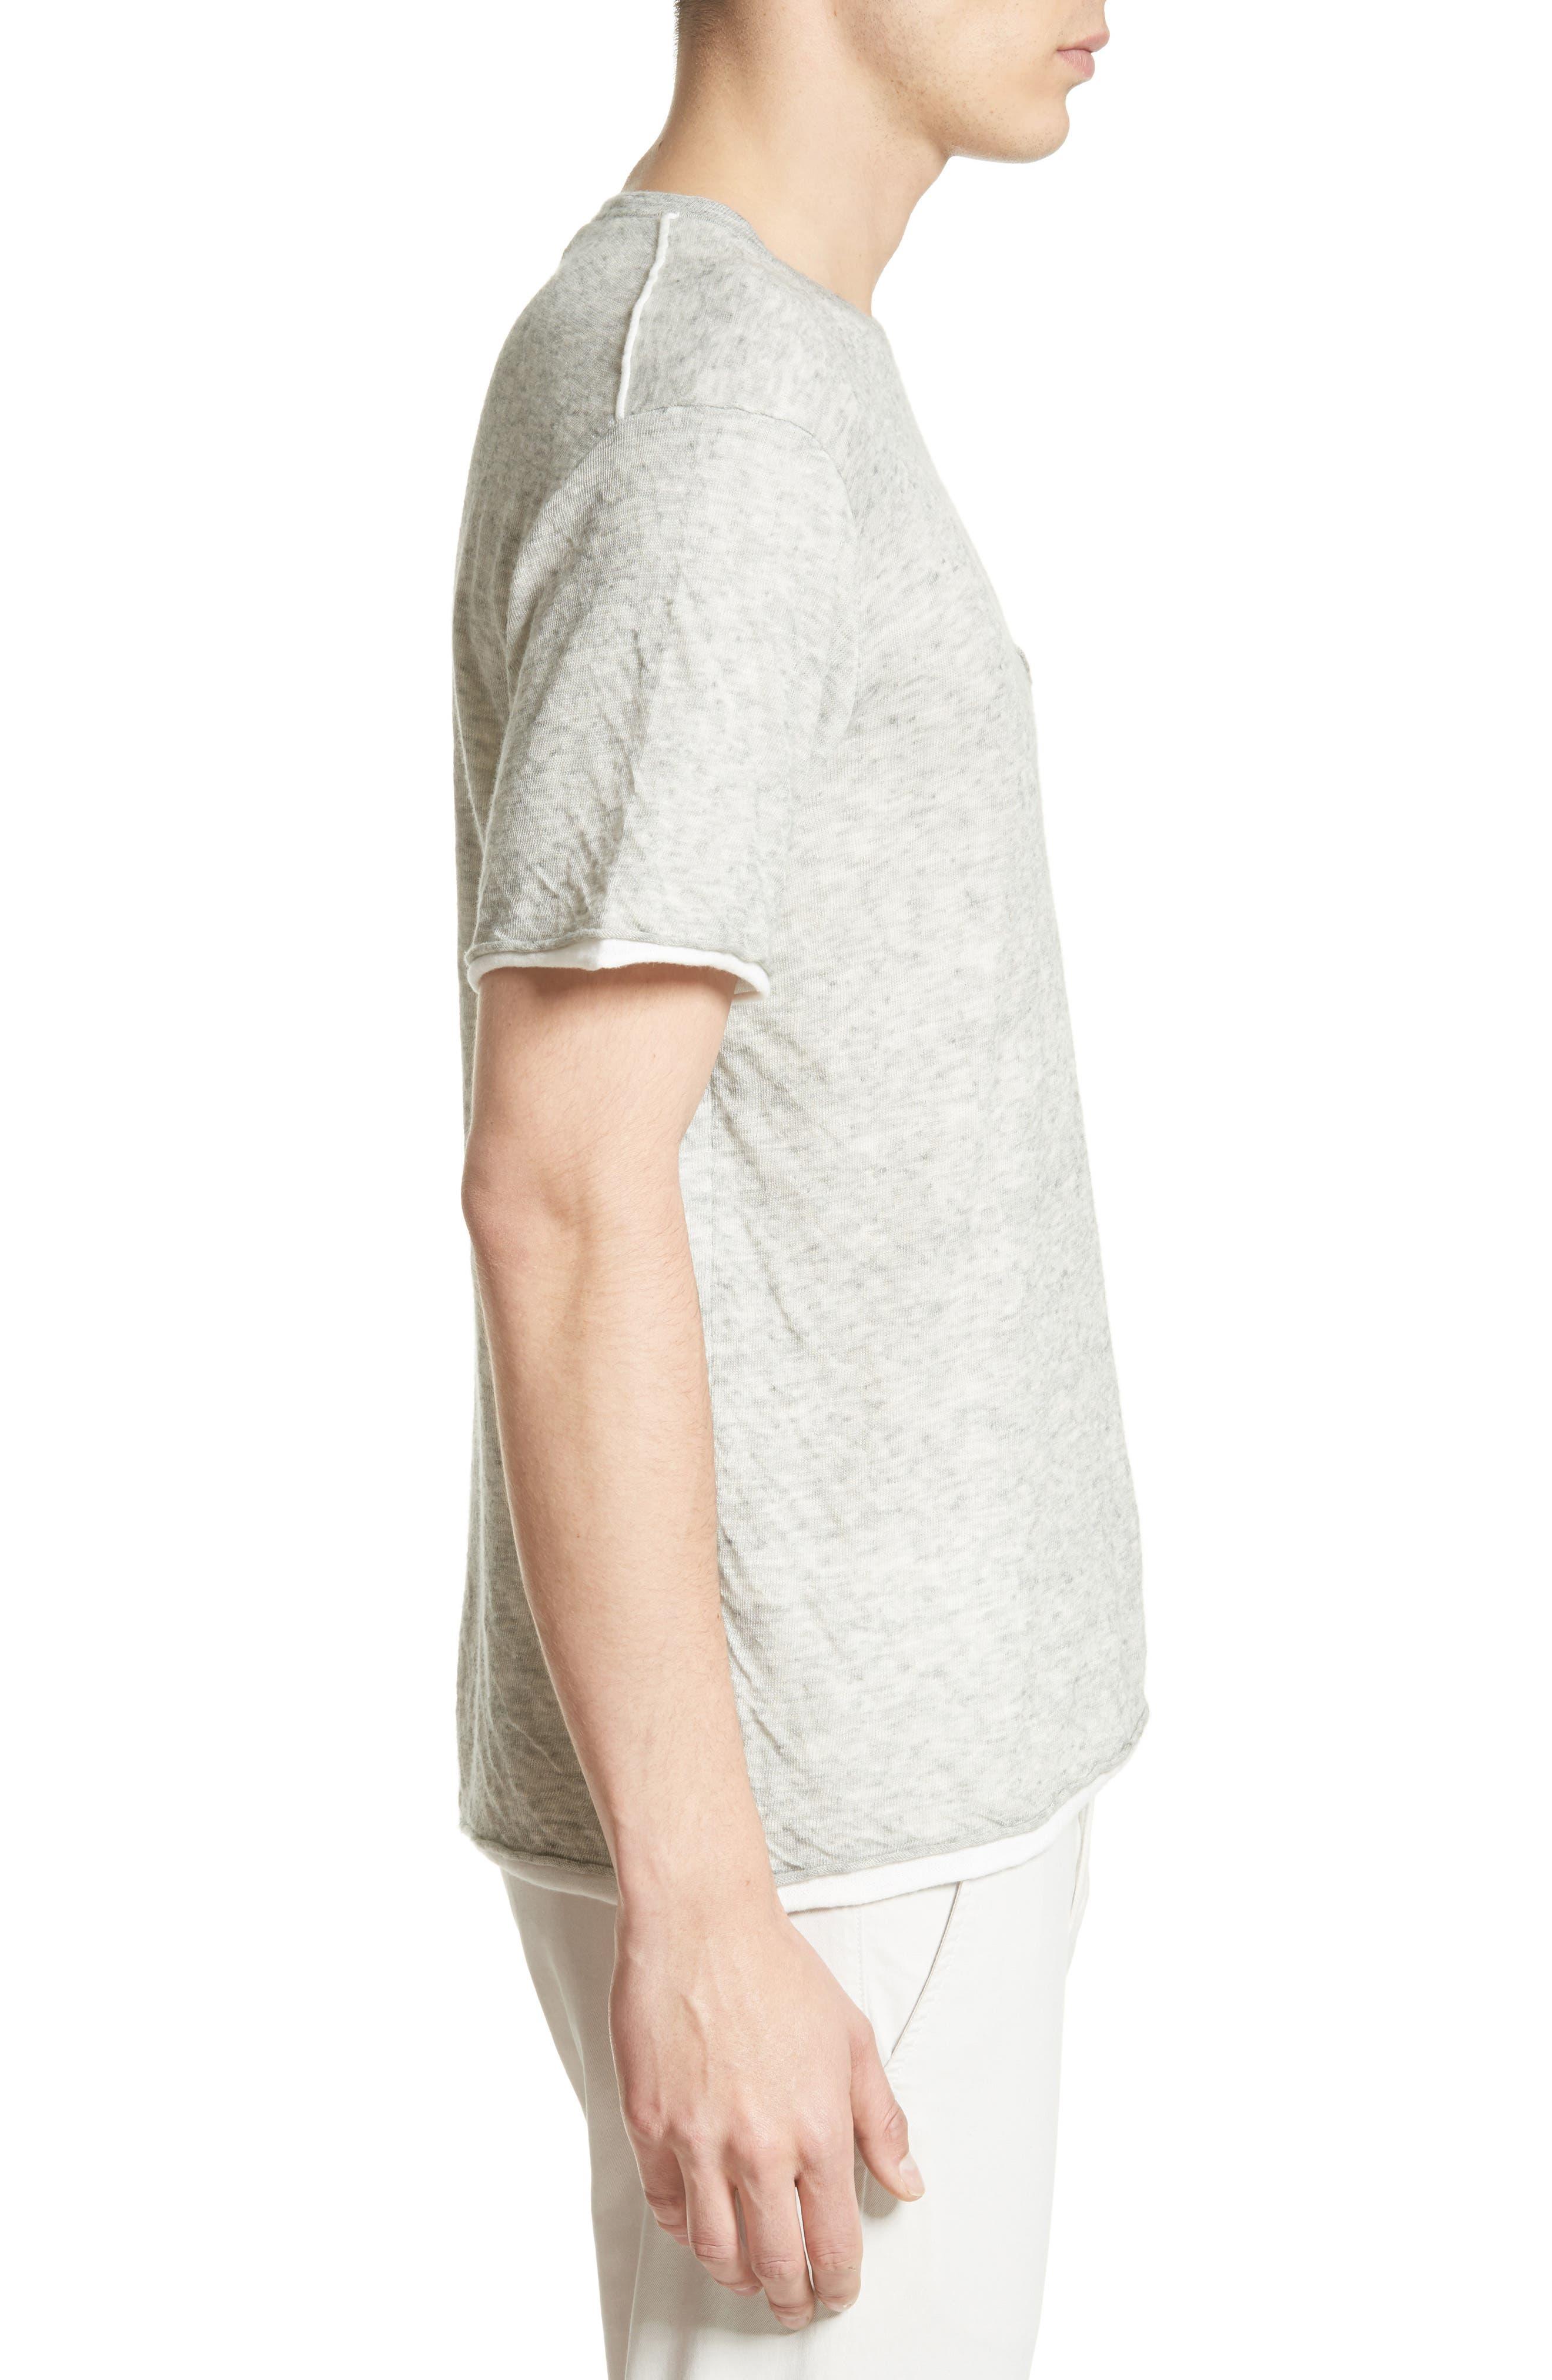 Tripp Cotton & Wool T-Shirt,                             Alternate thumbnail 3, color,                             068